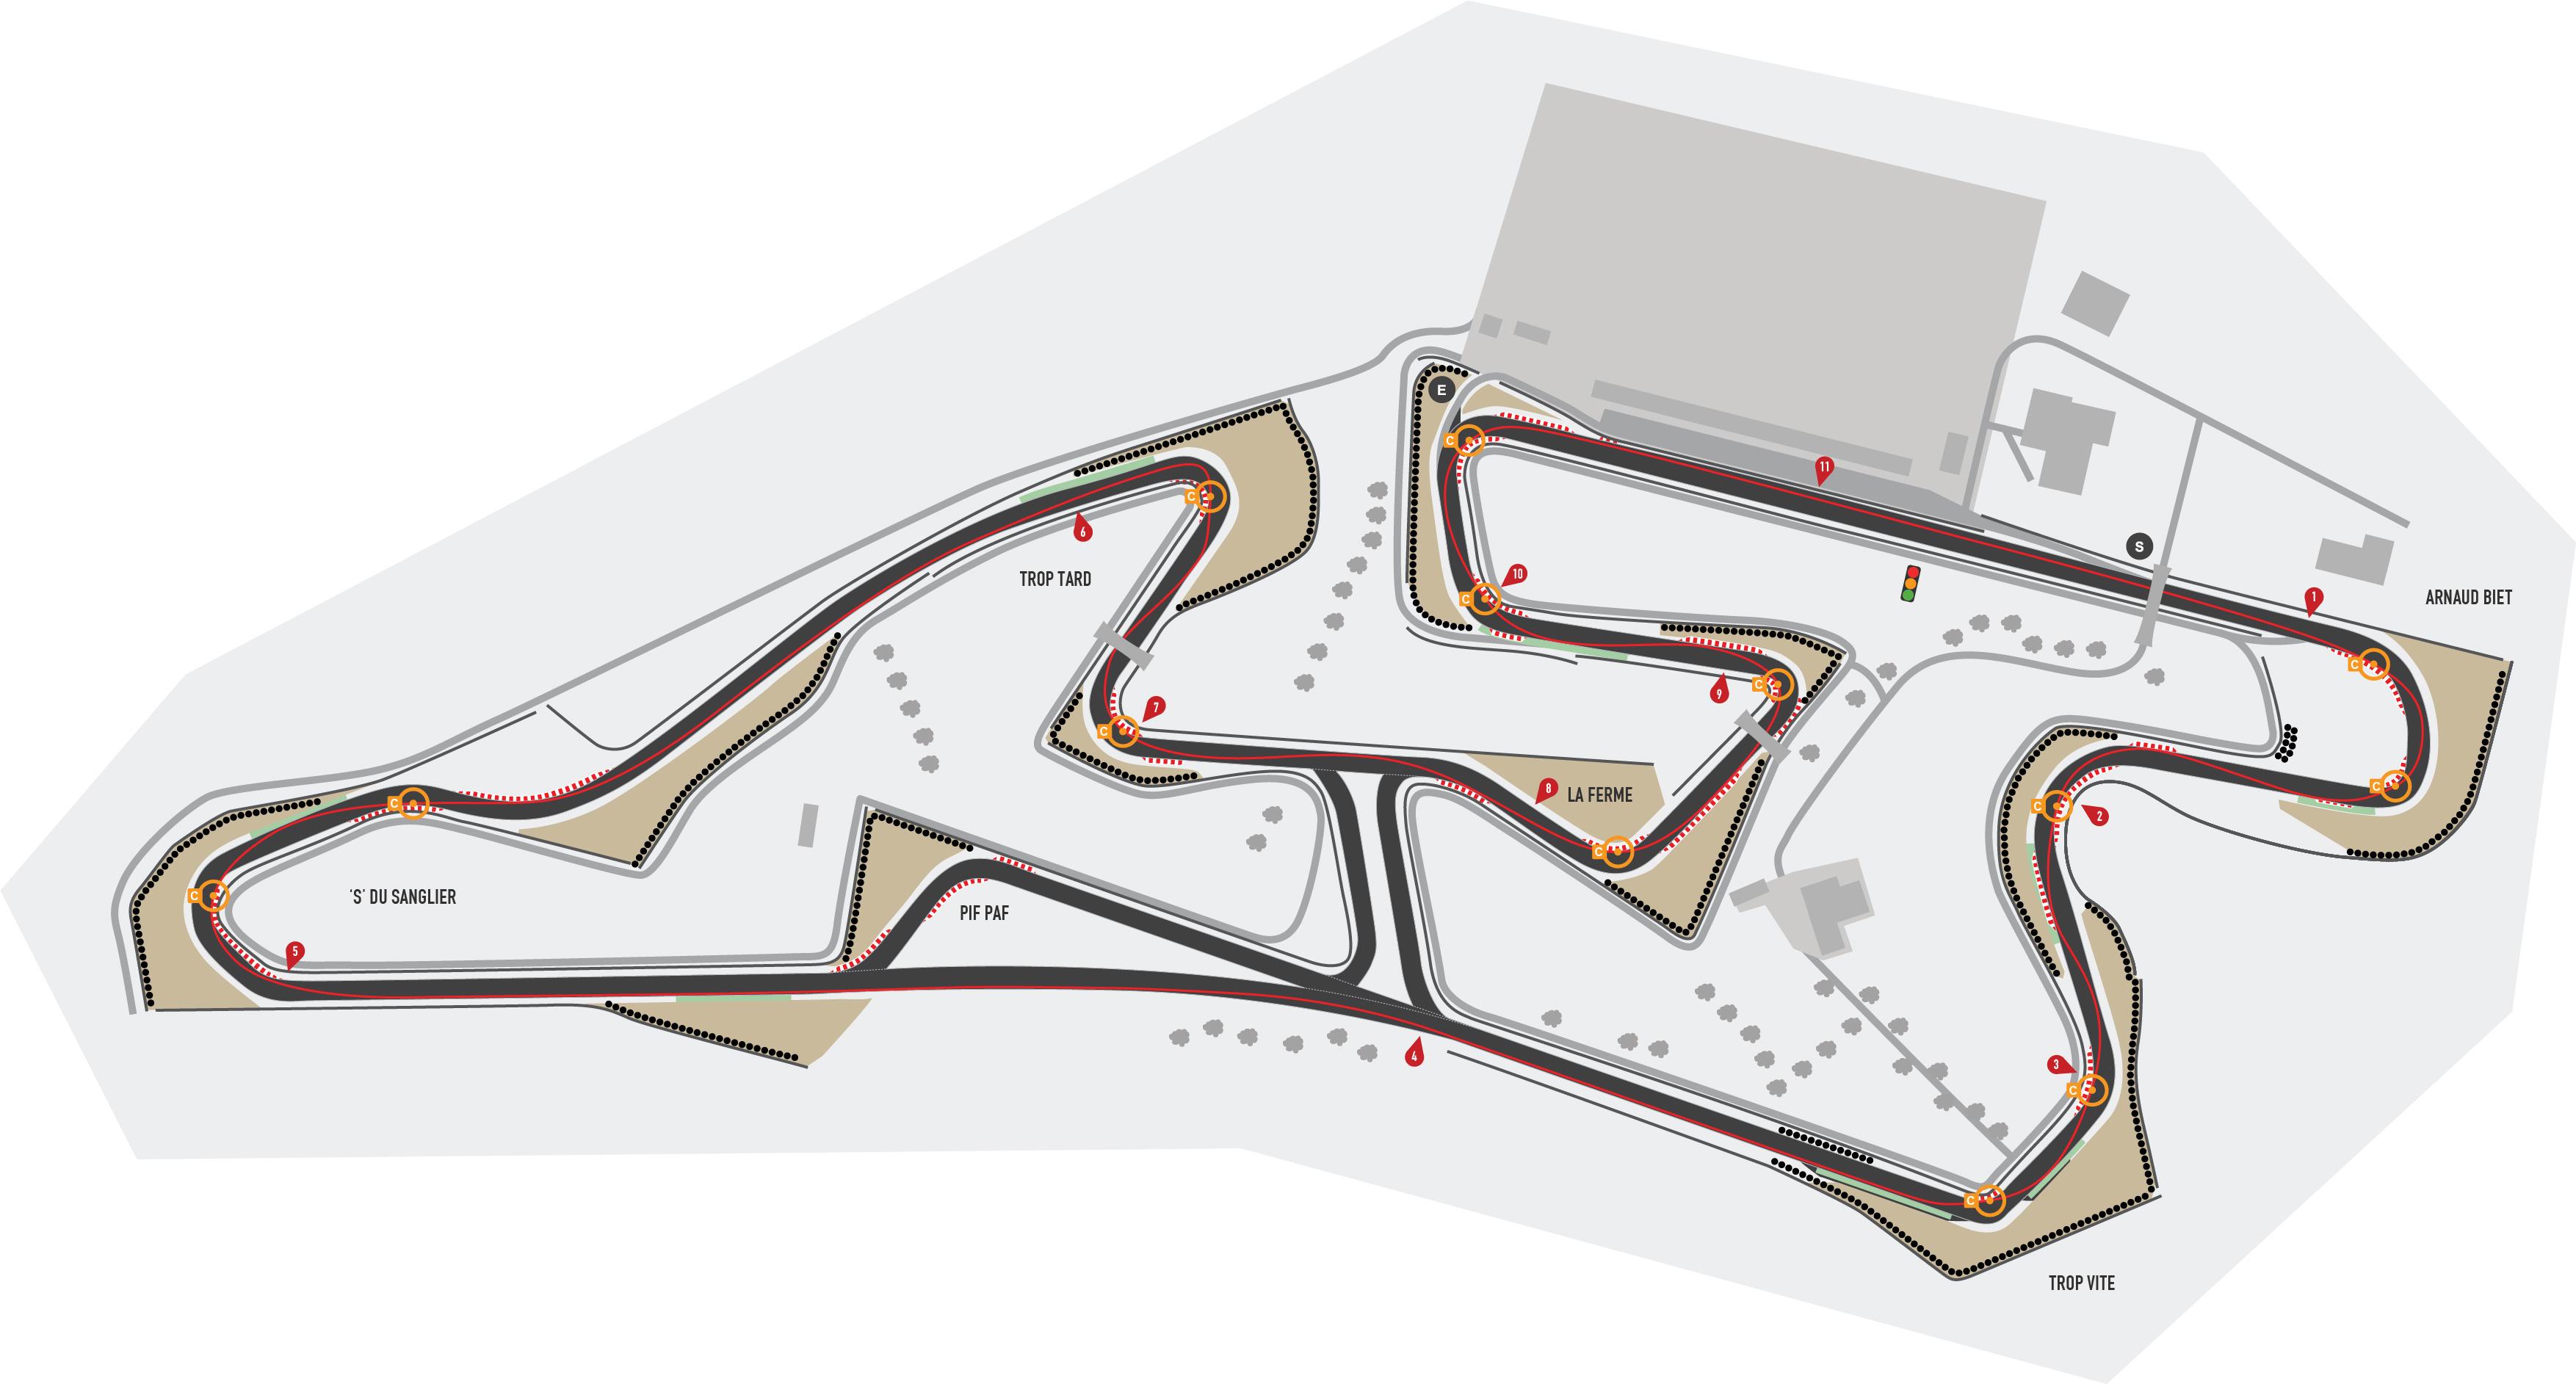 https://www.super-trackday.com/images/xl/val-de-vienne.jpg